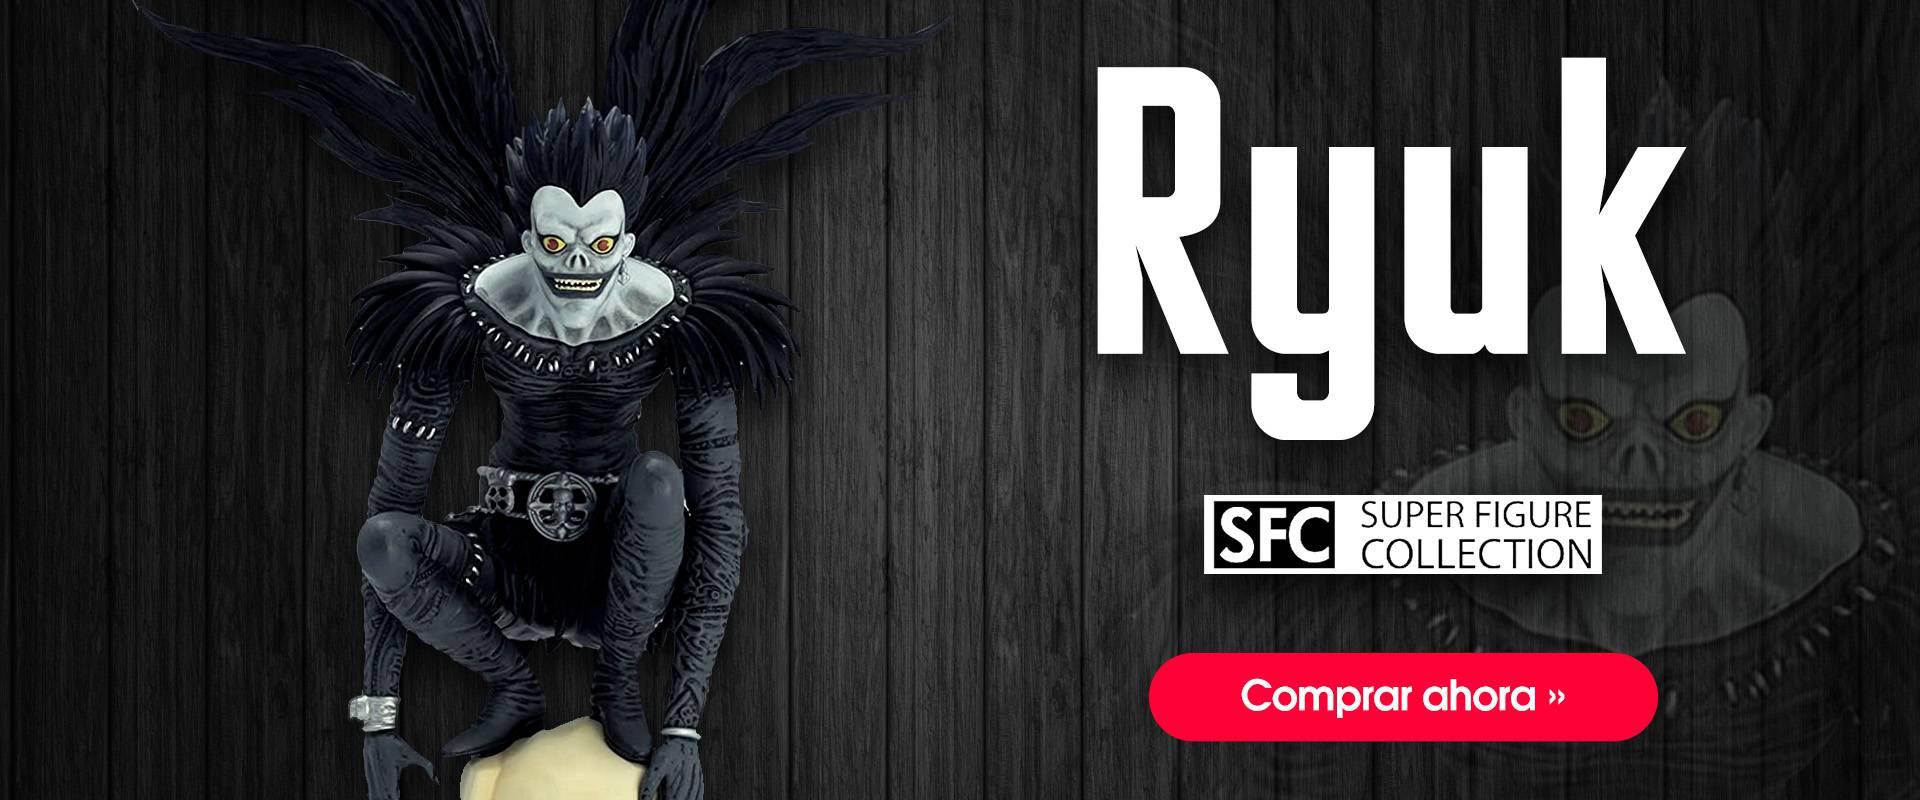 Ryuk SFC Colection